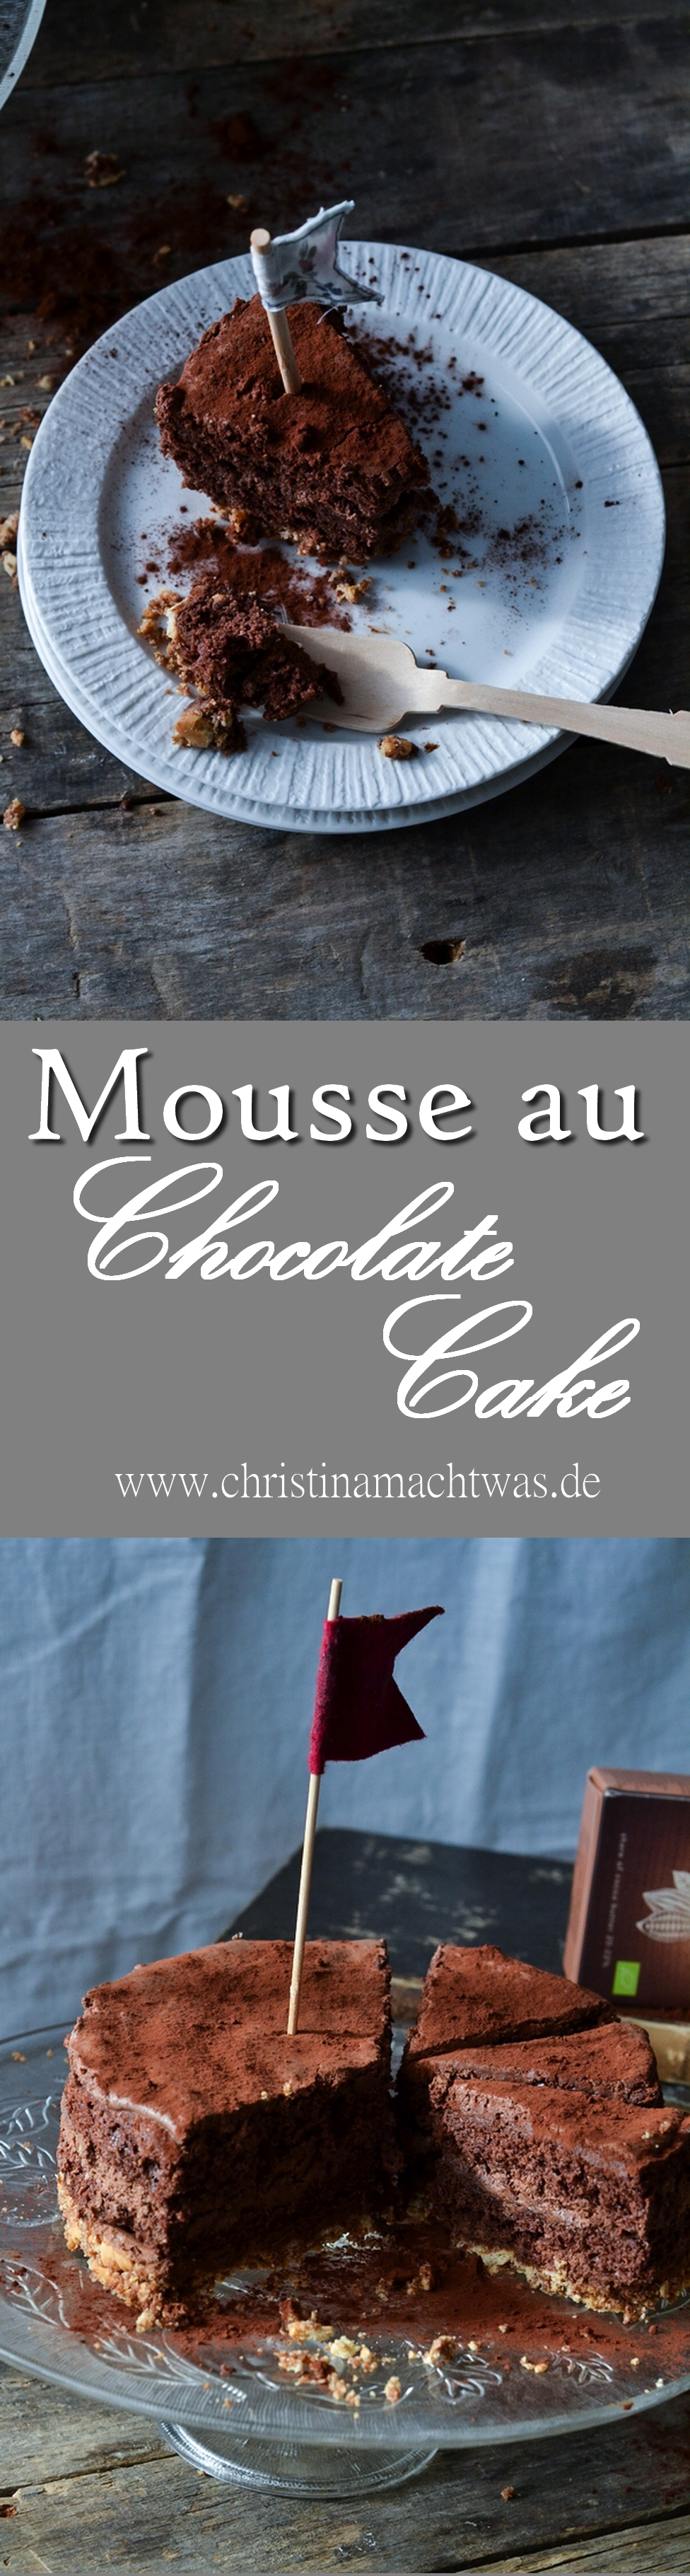 Meine super leckere Schokoladen-Mousse-Torte.  My super yummy Mousse au Chocolate Cake.